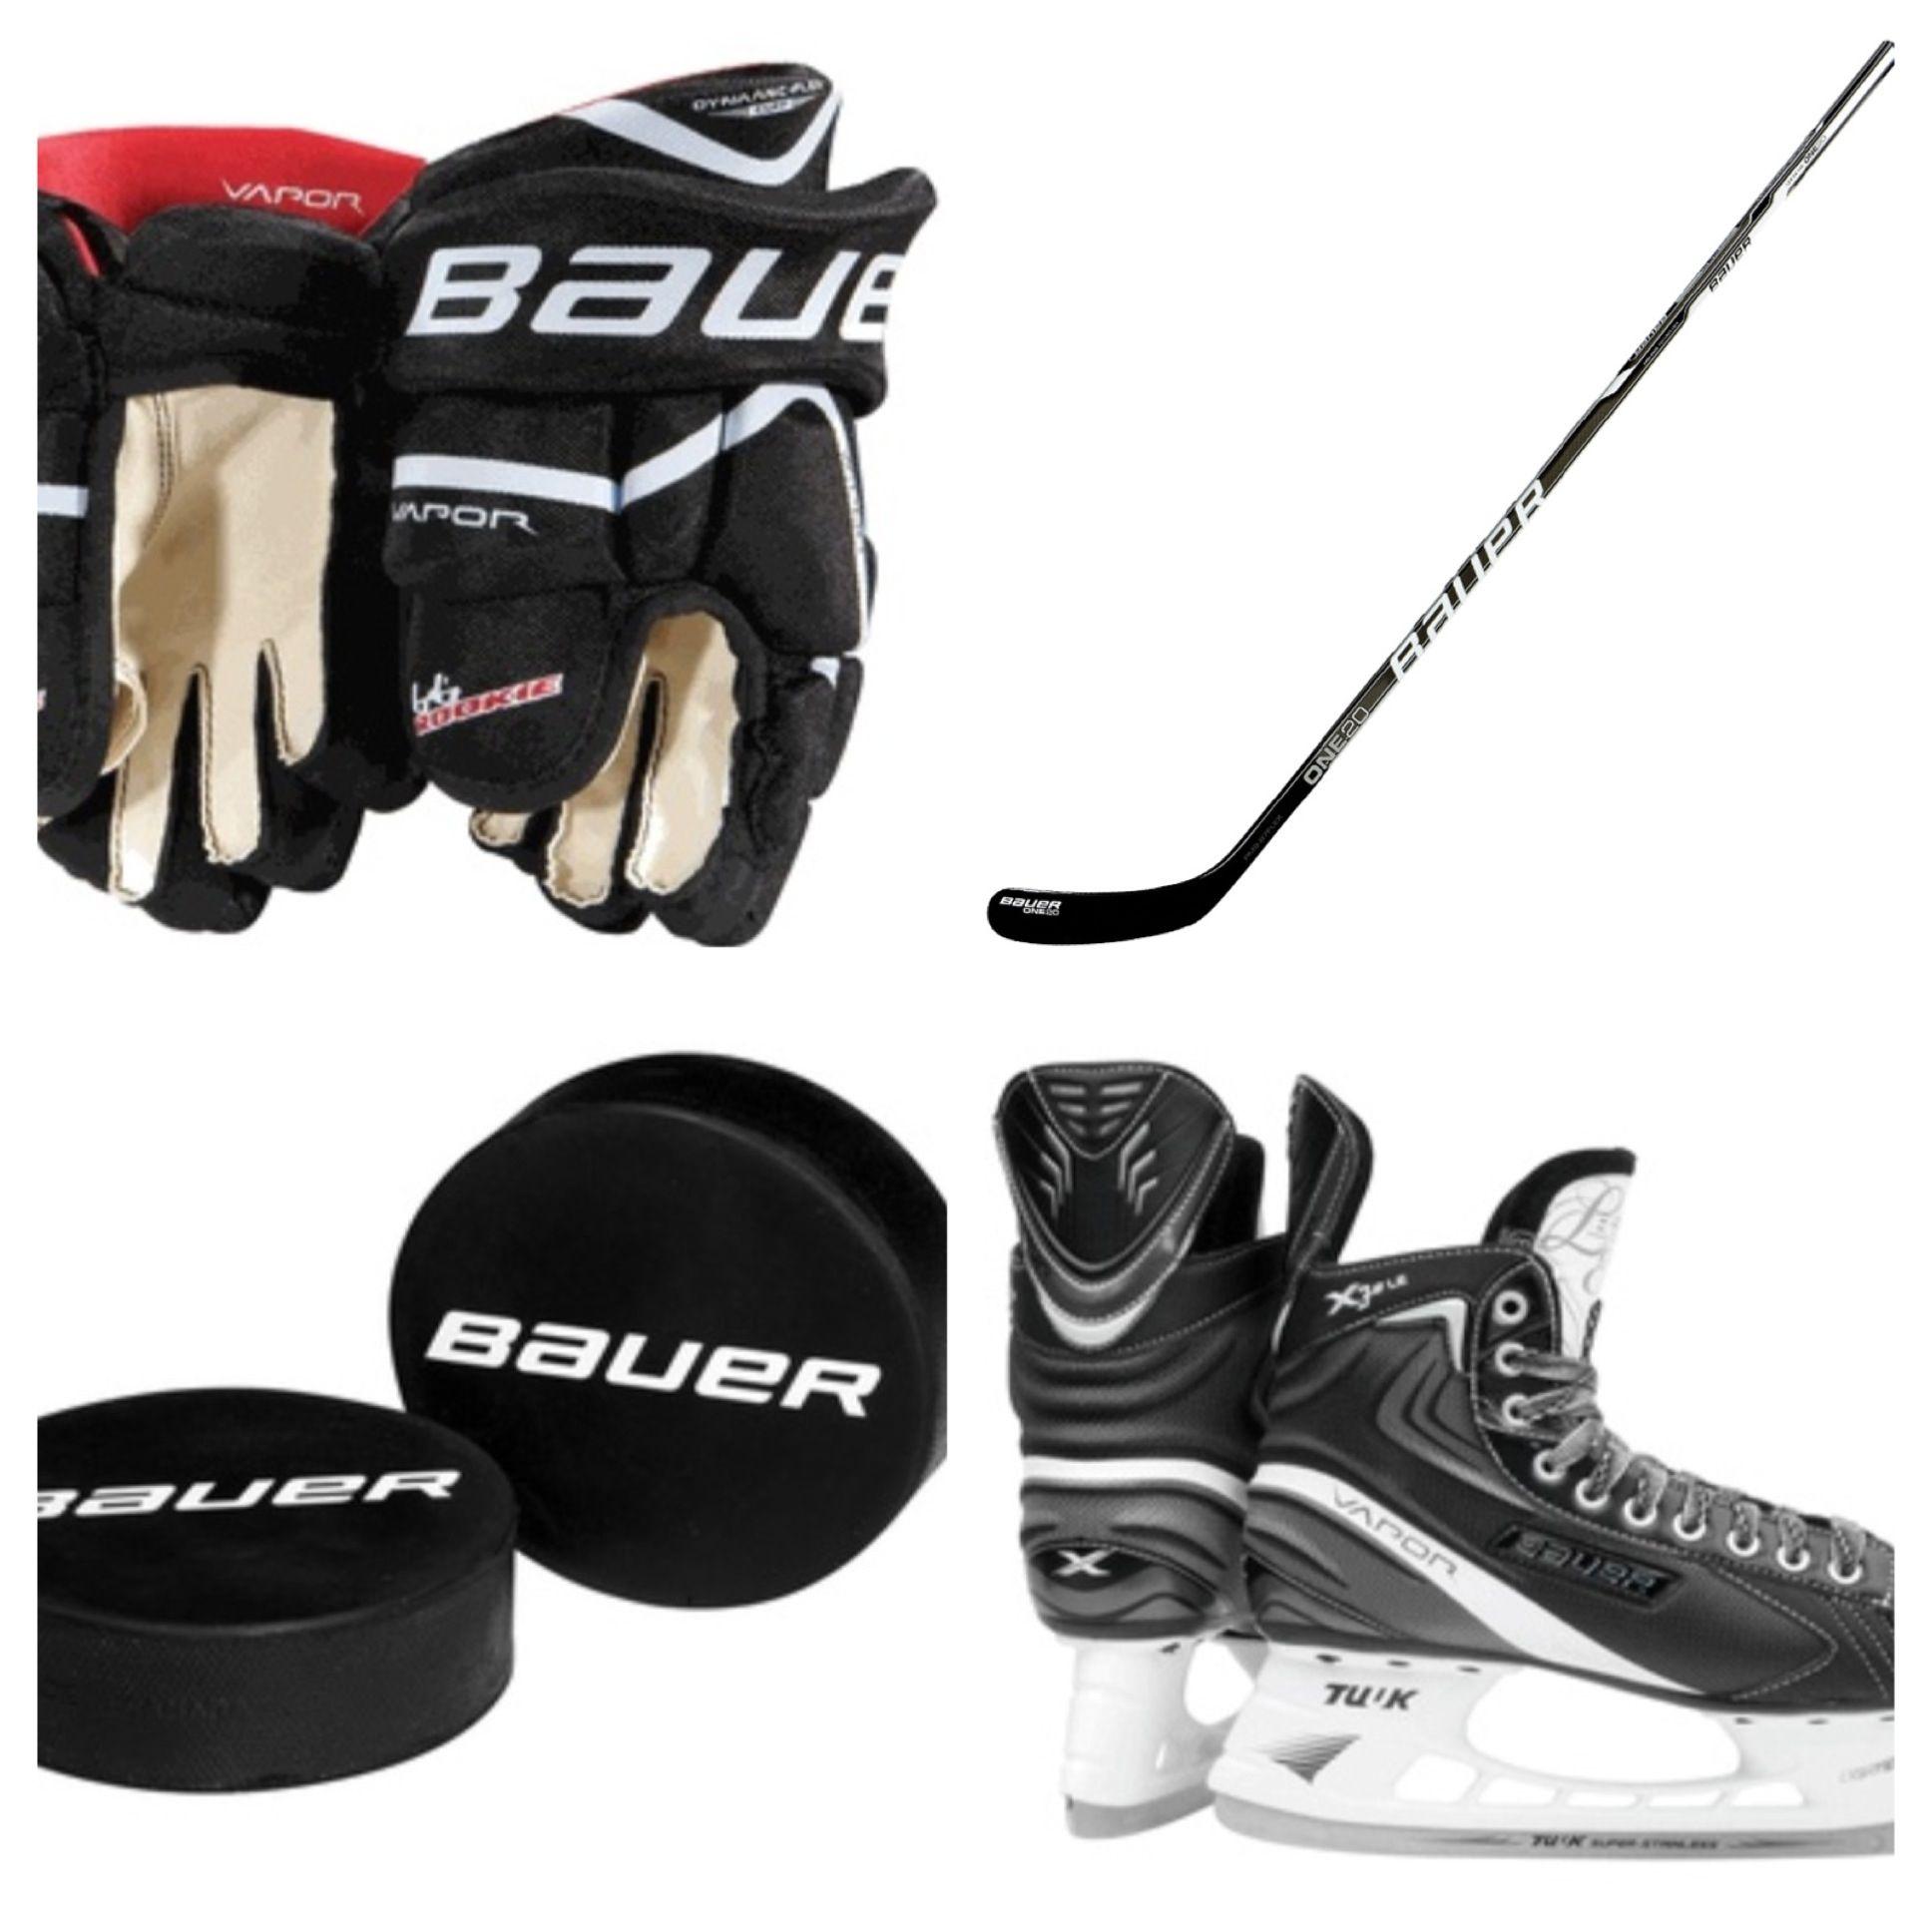 a573c9fb196 My Bauer One20 p88 52 flex stick, my Bauer Vapor x60 gloves, and my ...